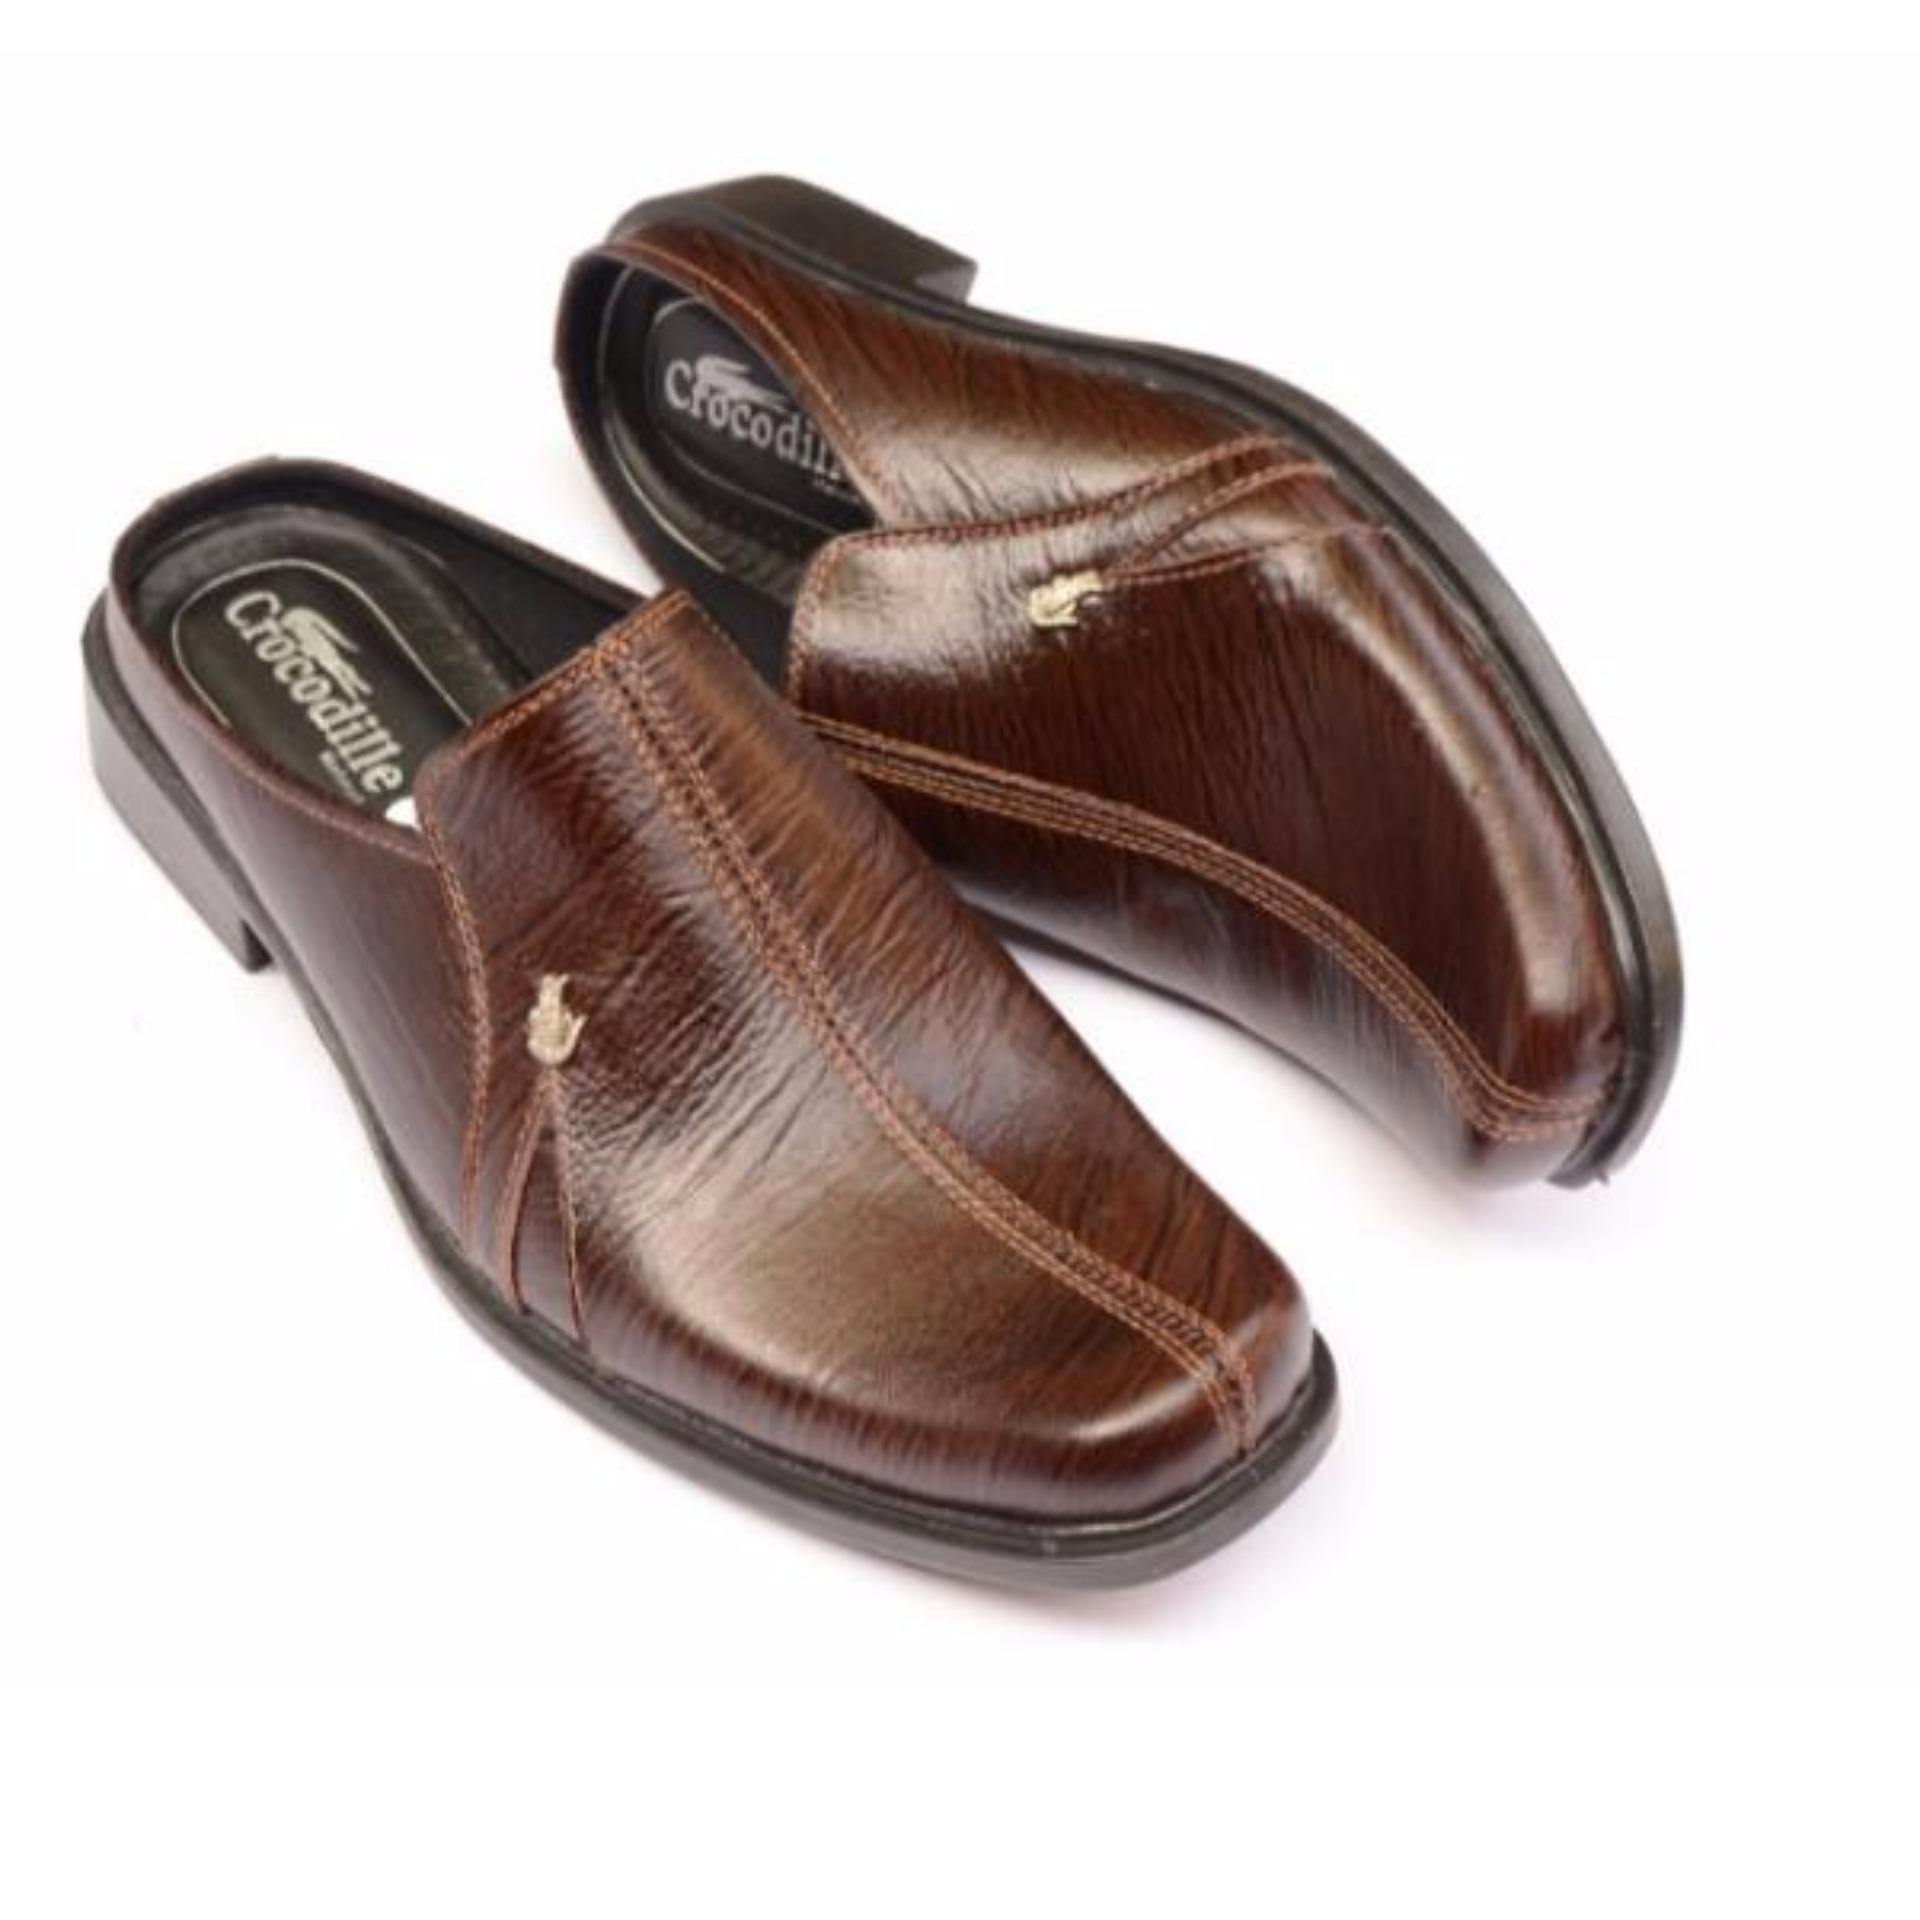 Crocodile Sepatu Sandal Selop Pria Sepatu Pria Sandal Pria - Kulit Sapi Asli .